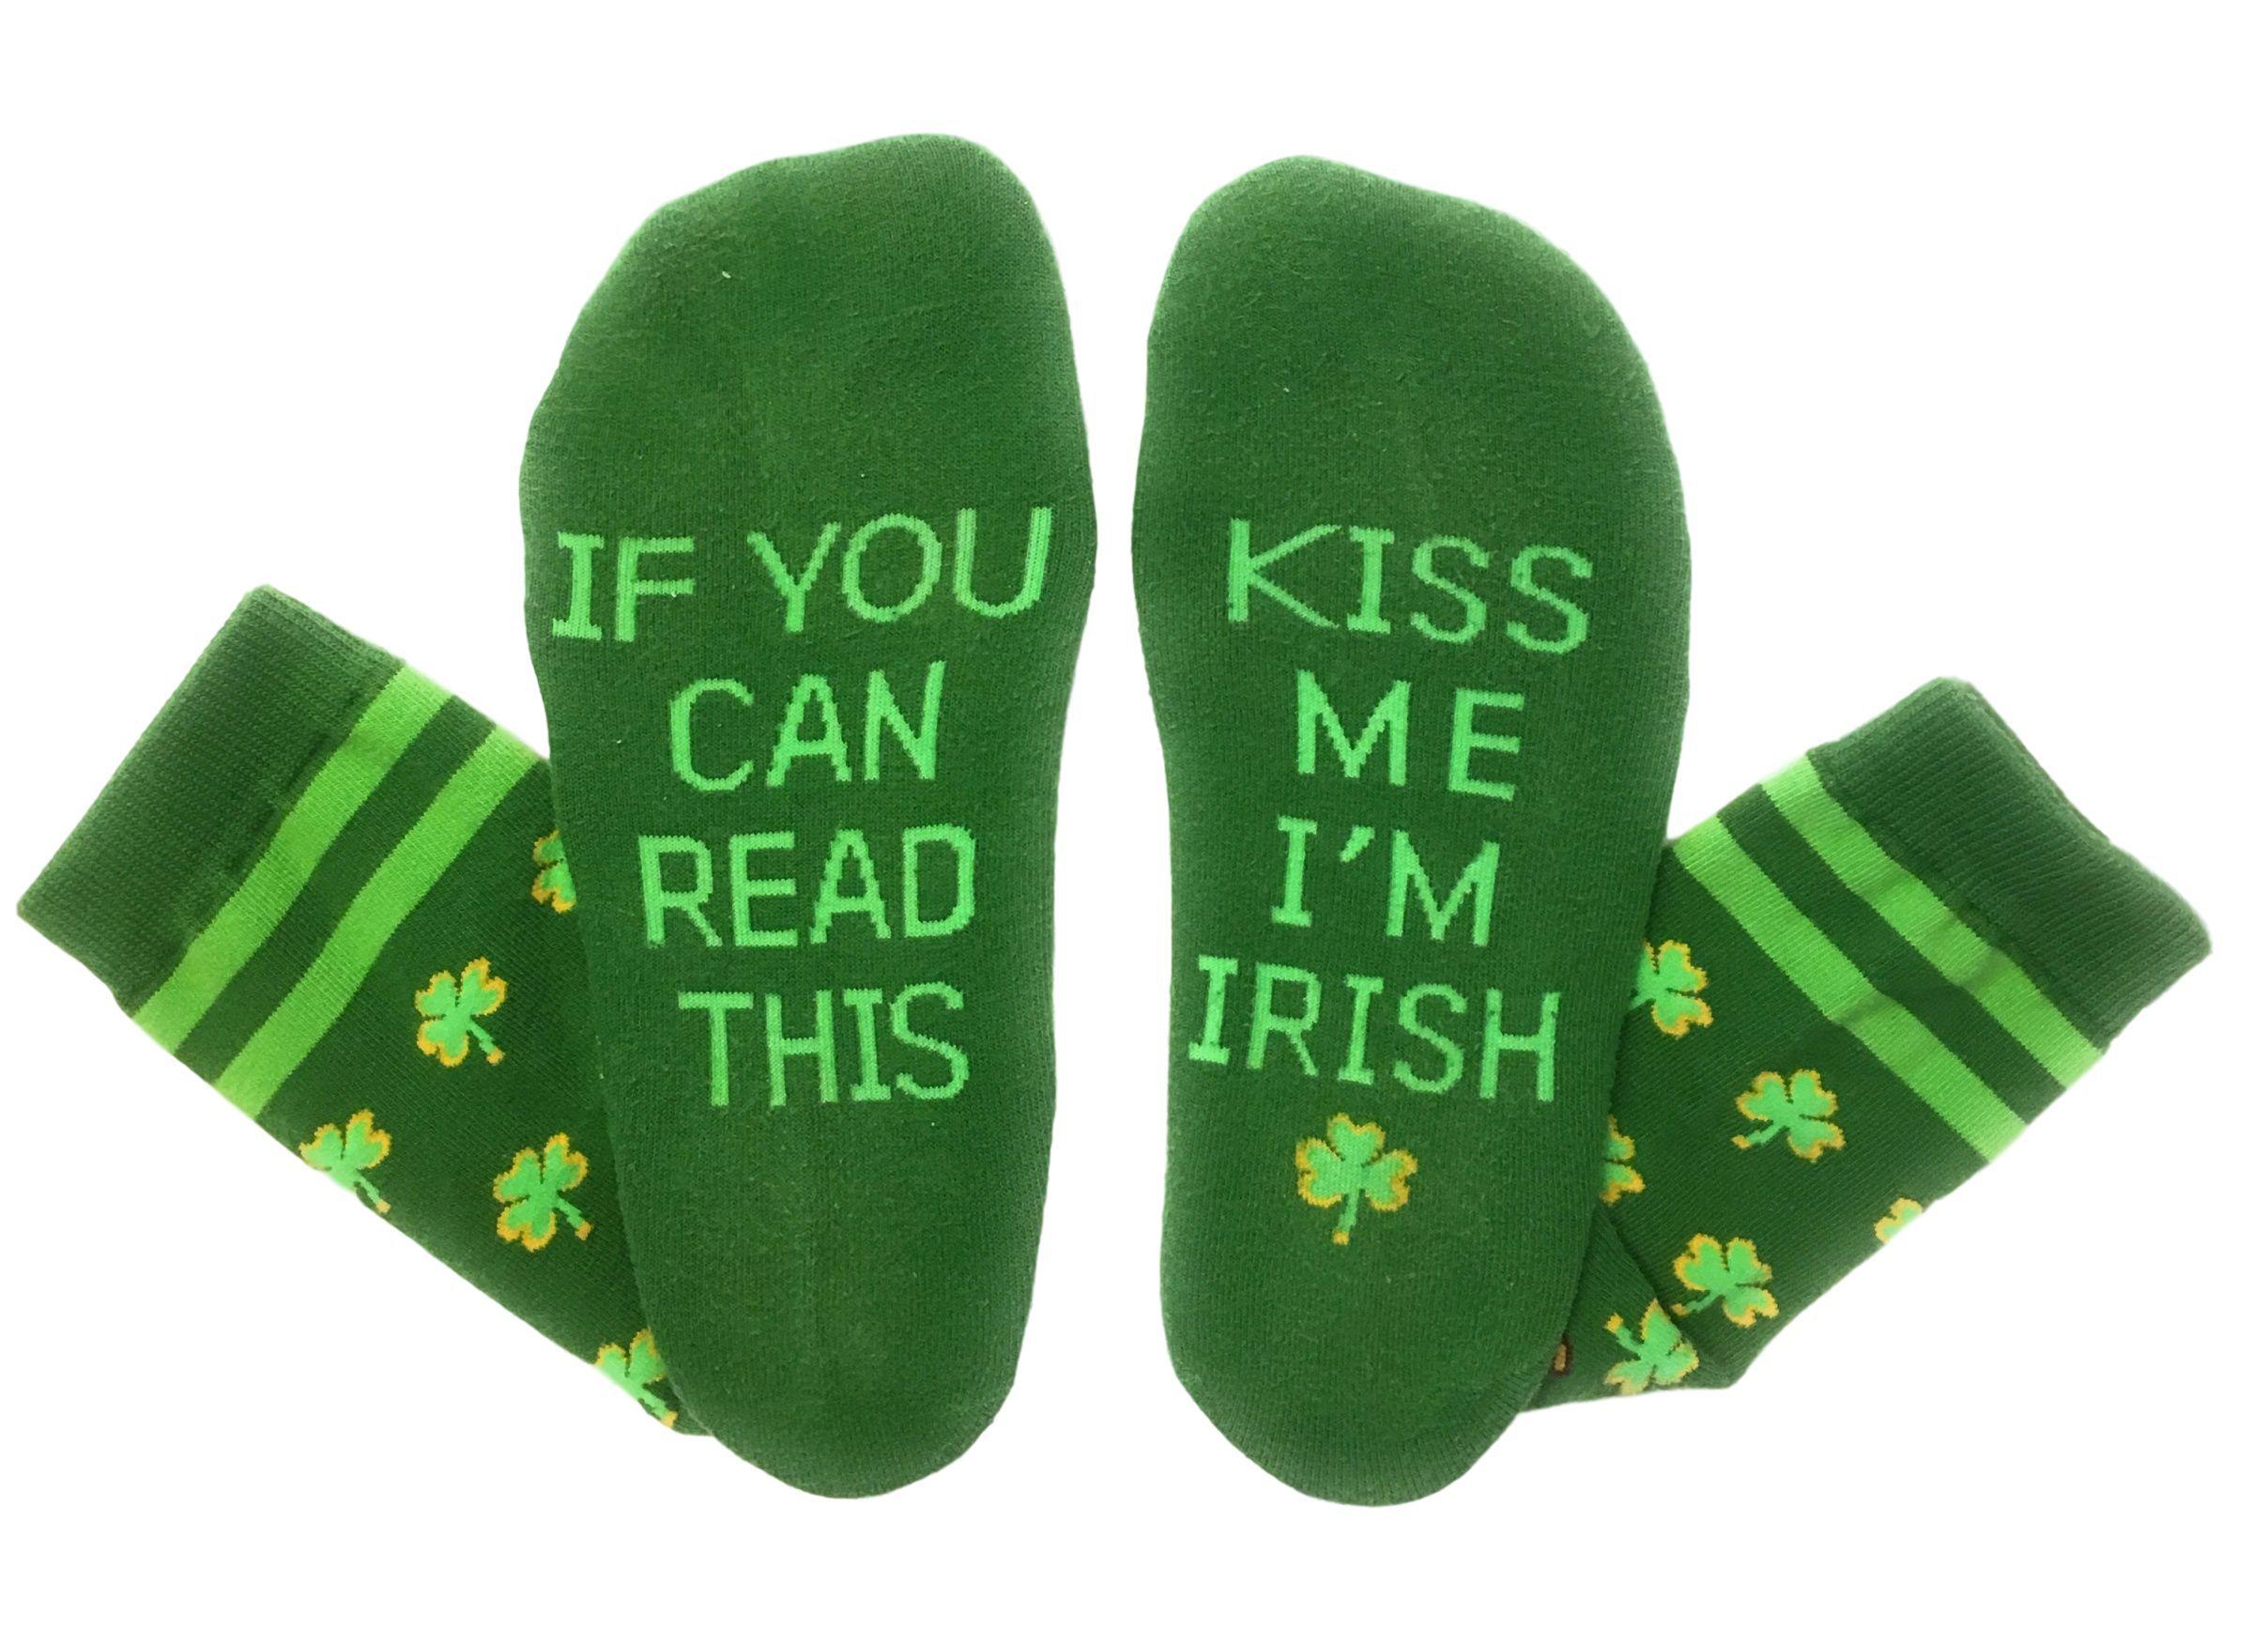 KISS ME Compression Socks For Women Casual Fashion Crew Socks